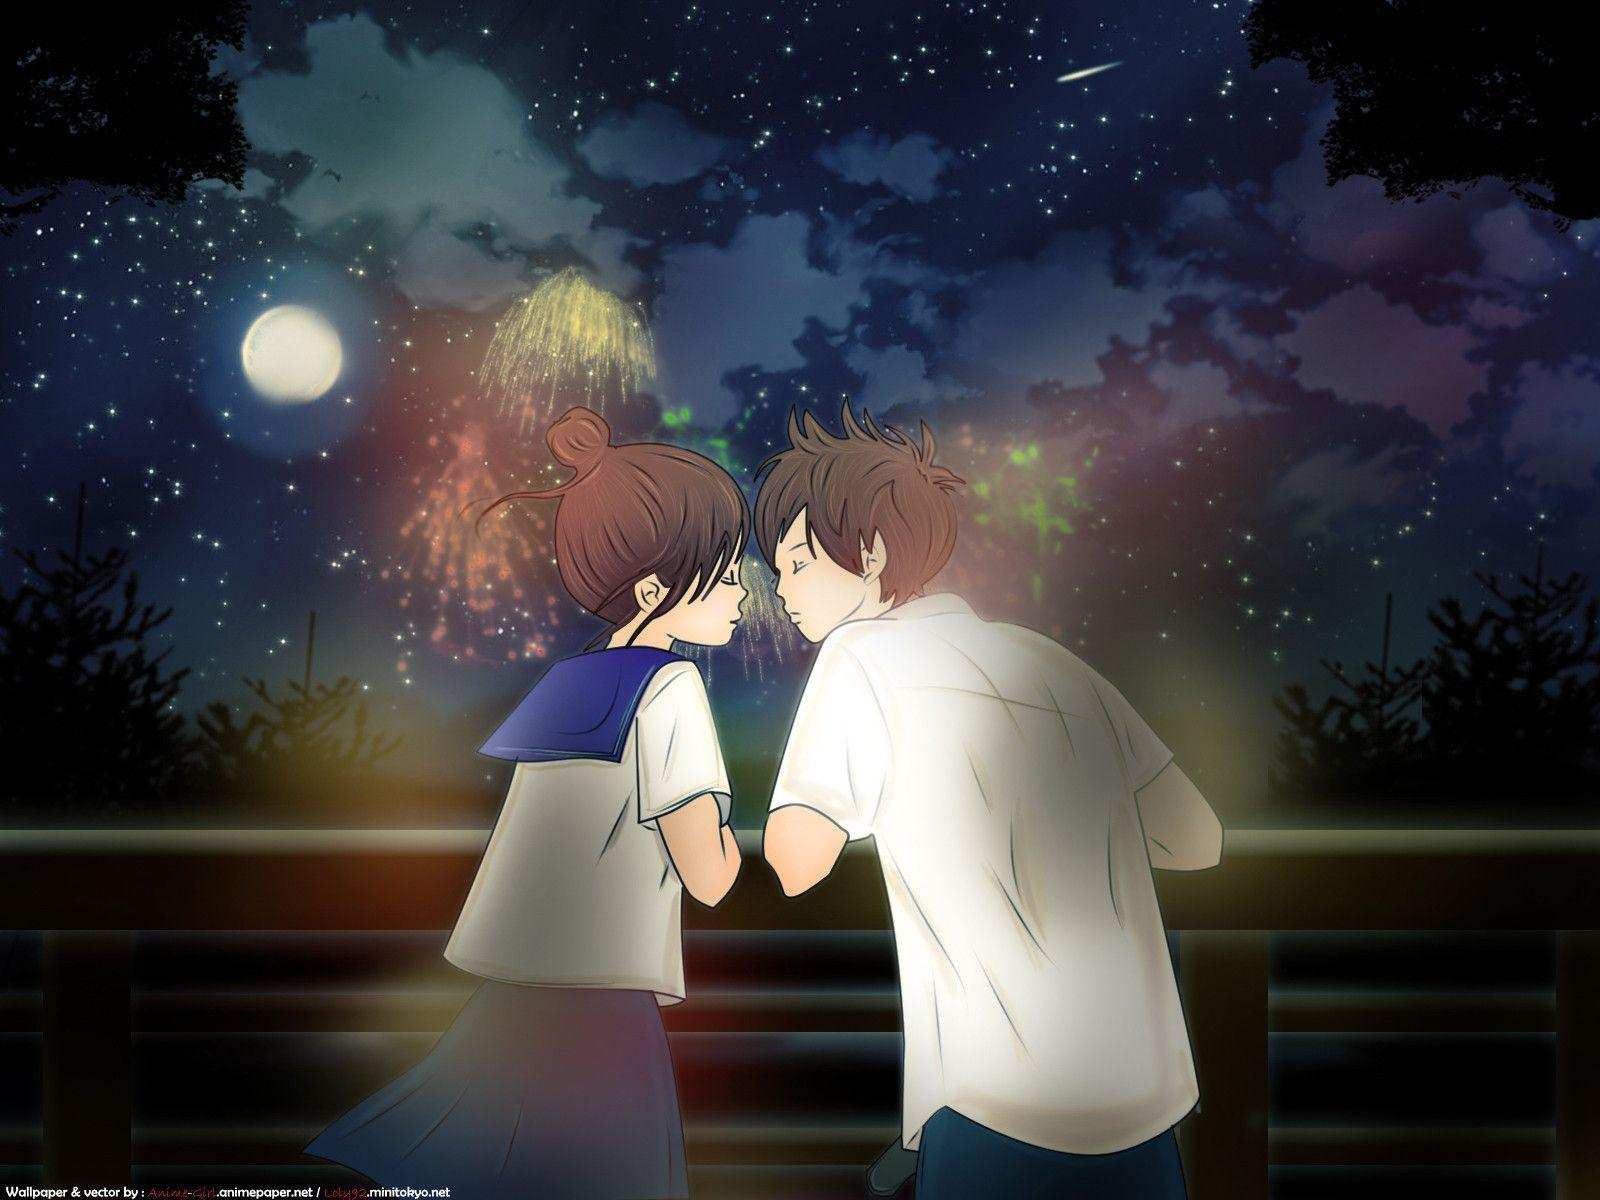 romantic anime wallpaper - photo #2